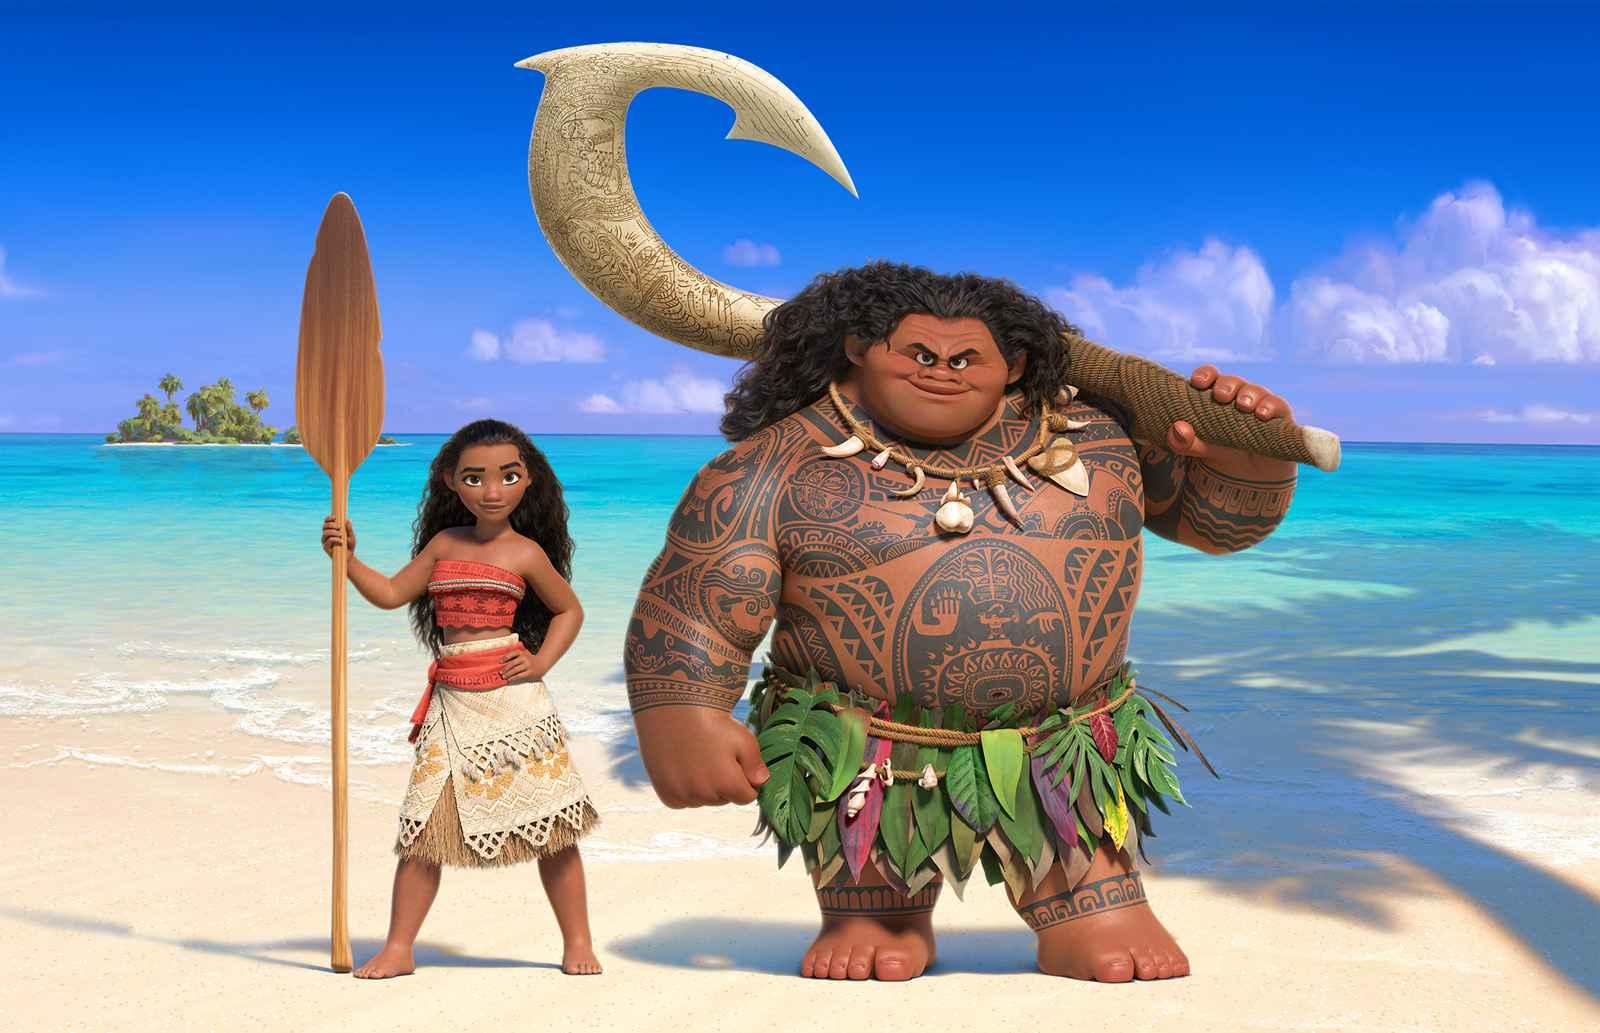 La voix de Vaiana (Disney) à Tahiti la semaine prochaine